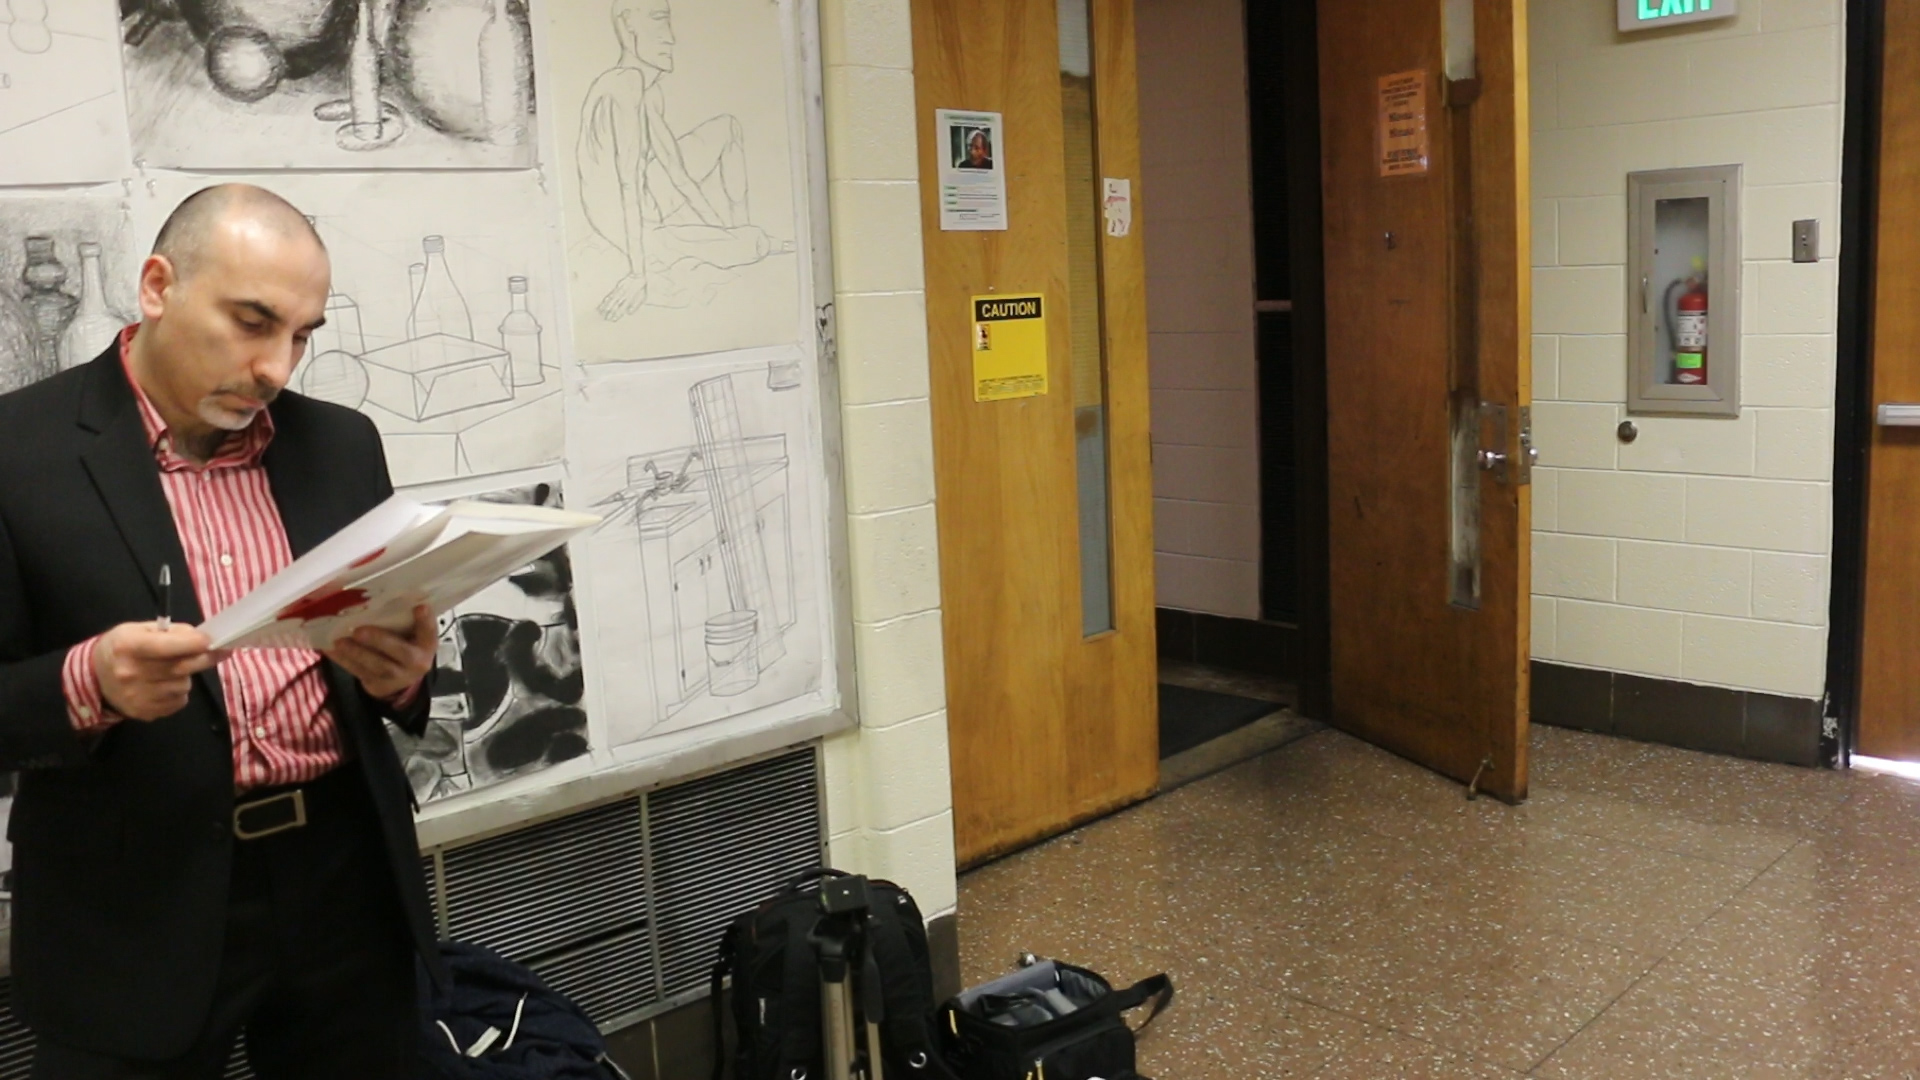 Sam in Hallway